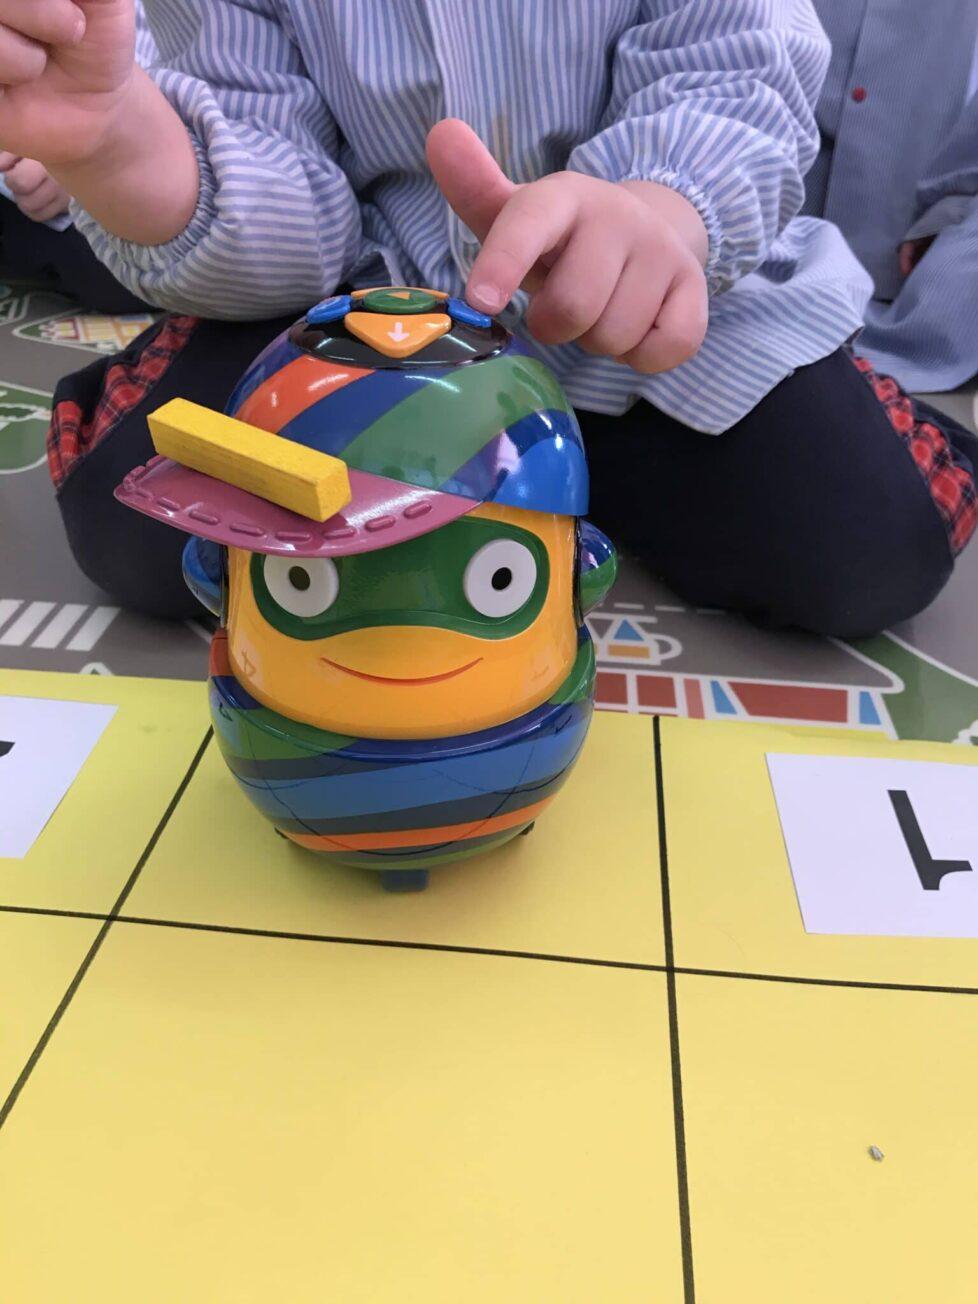 jugos y robótica Infantil